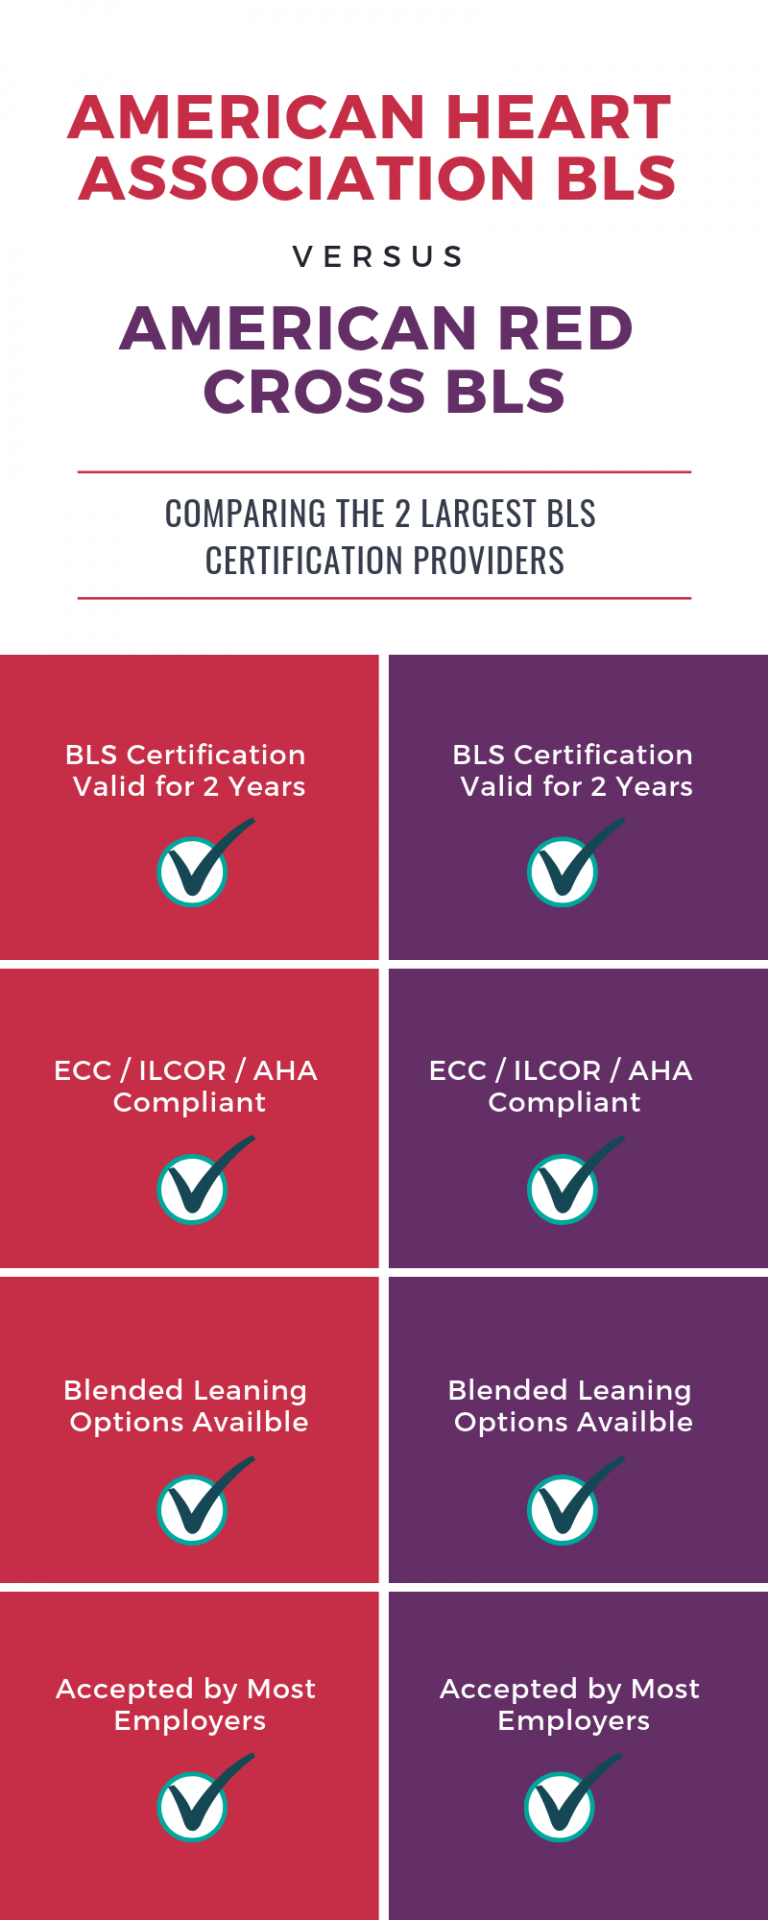 American Heart Association BLS vs American Red Cross BLS Certifications